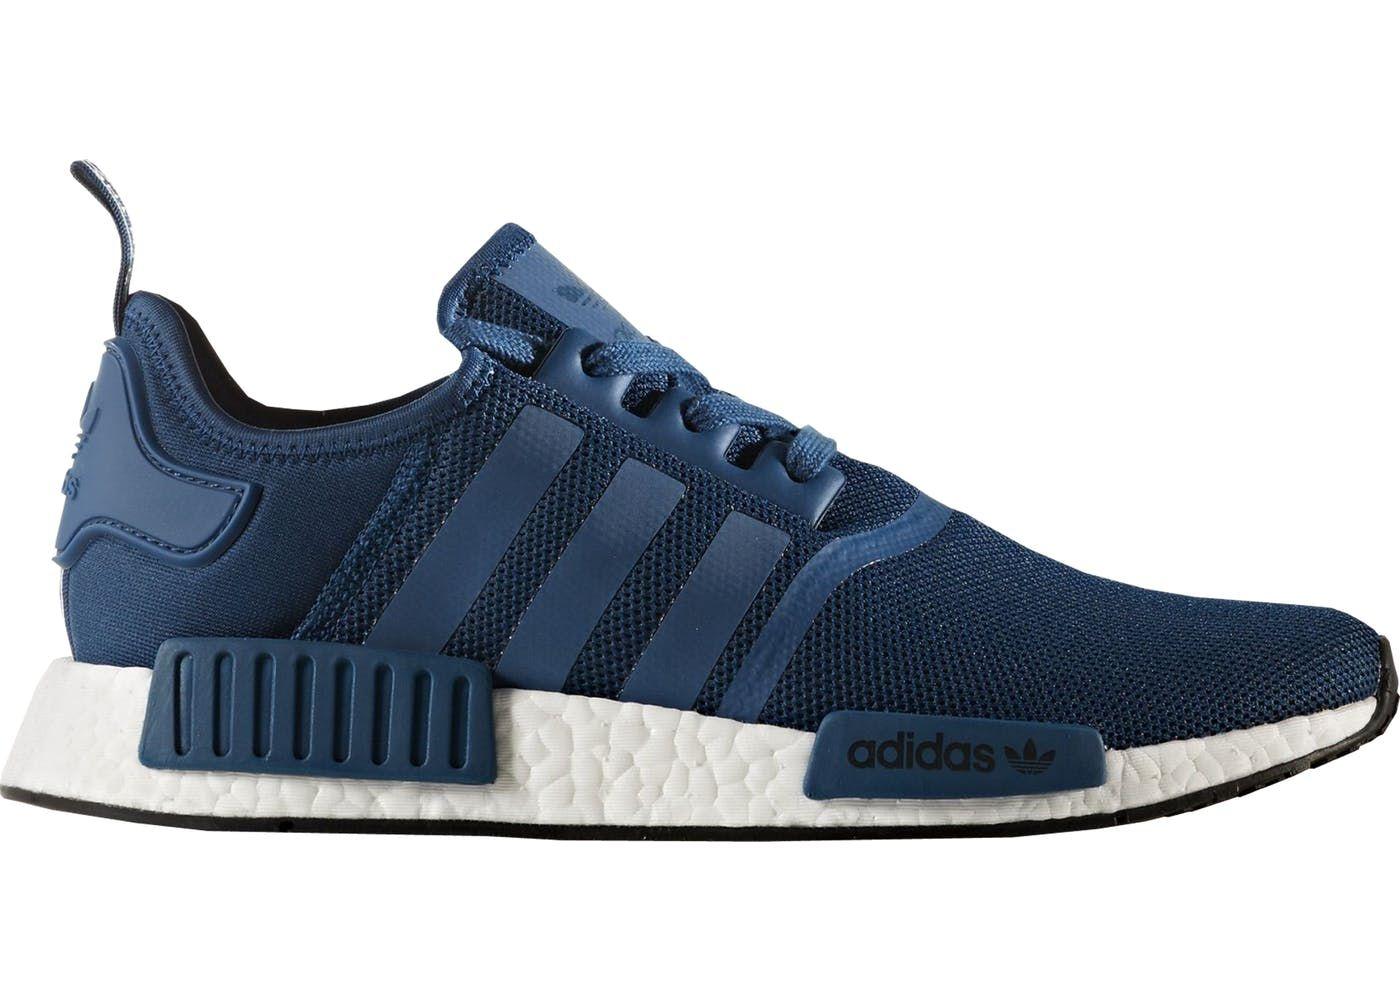 Adidas Nmd R1 Blue Night Adidas Shoes Women Adidas Nmd Blue Womens Tennis Shoes